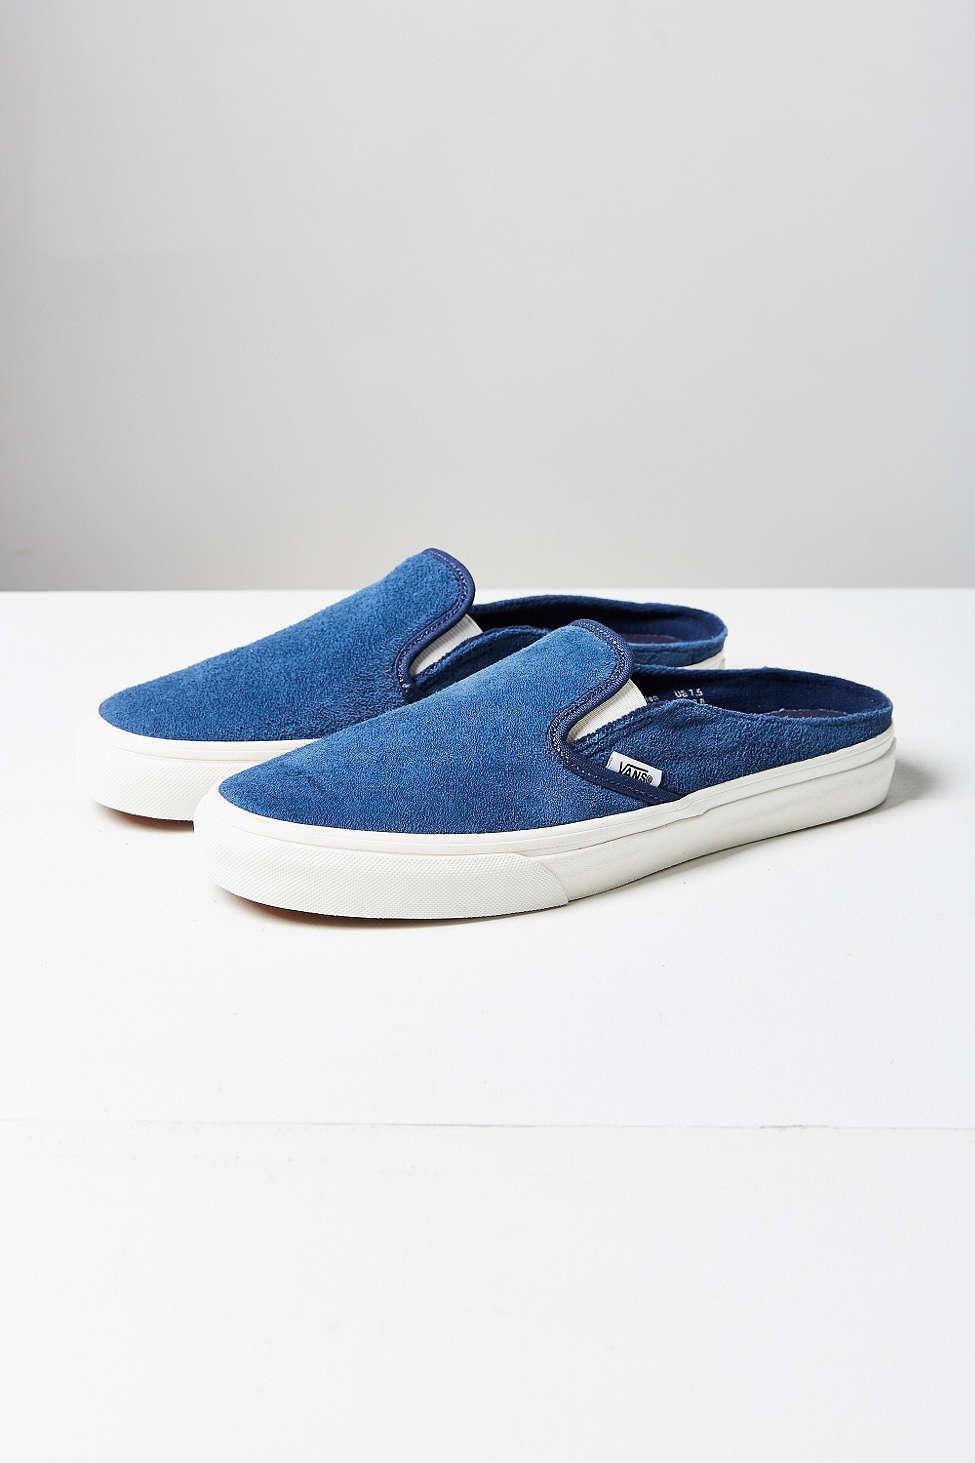 49a3a99ccf7c Vans Scotchgard Slip-on Mule Sneaker in Blue - Lyst